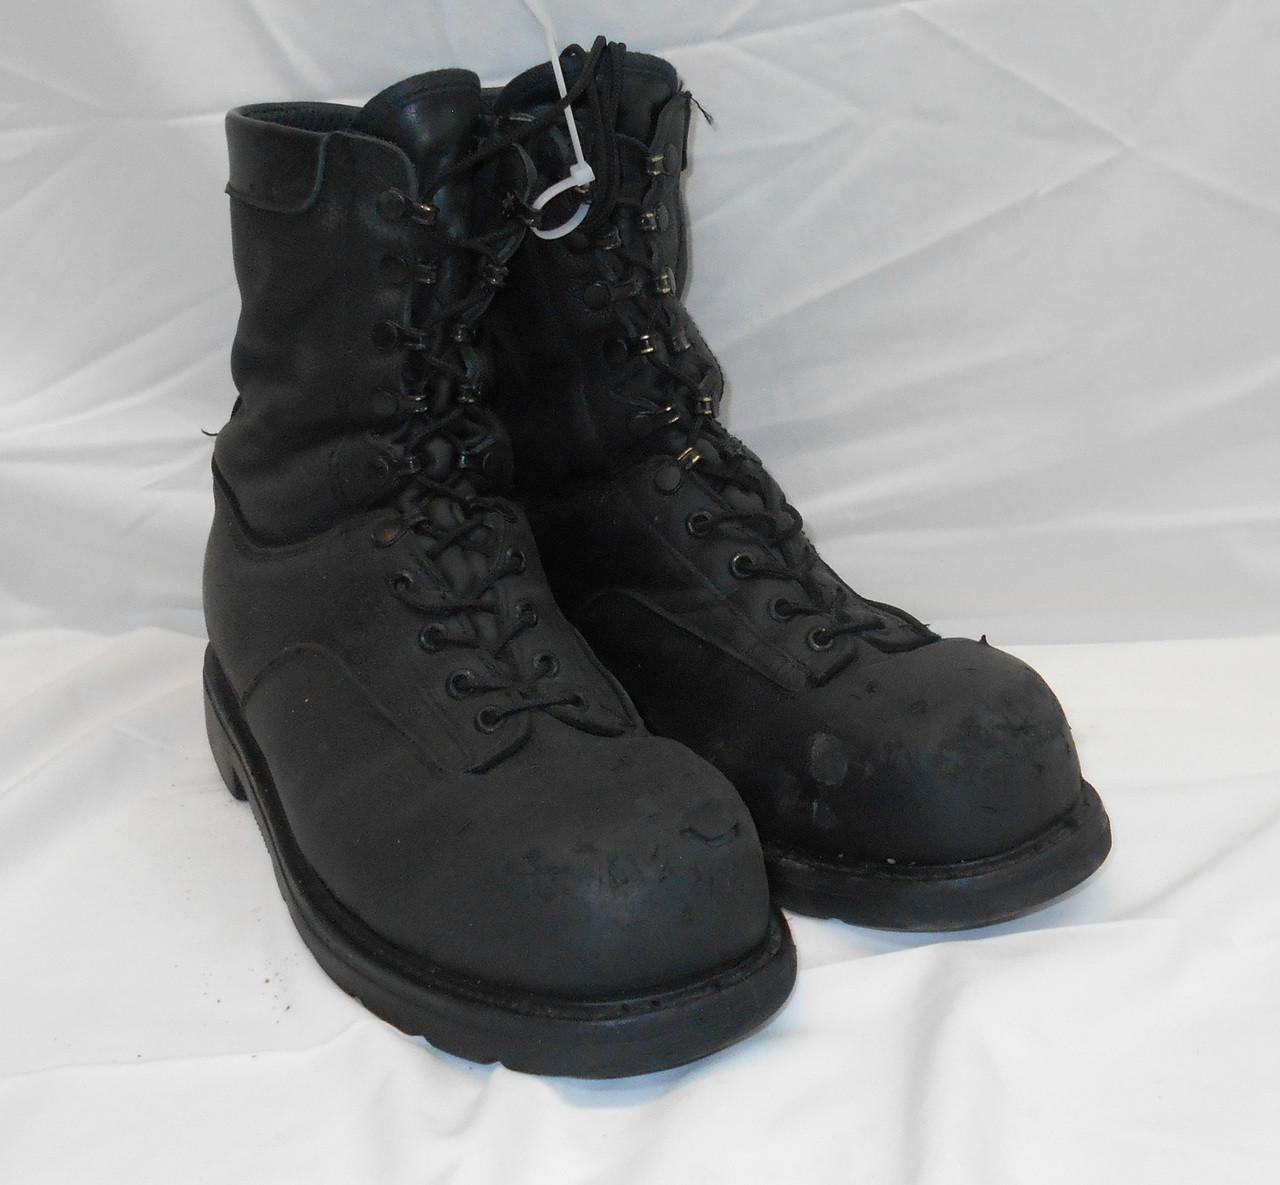 General Purpose Combat Boots (Black)